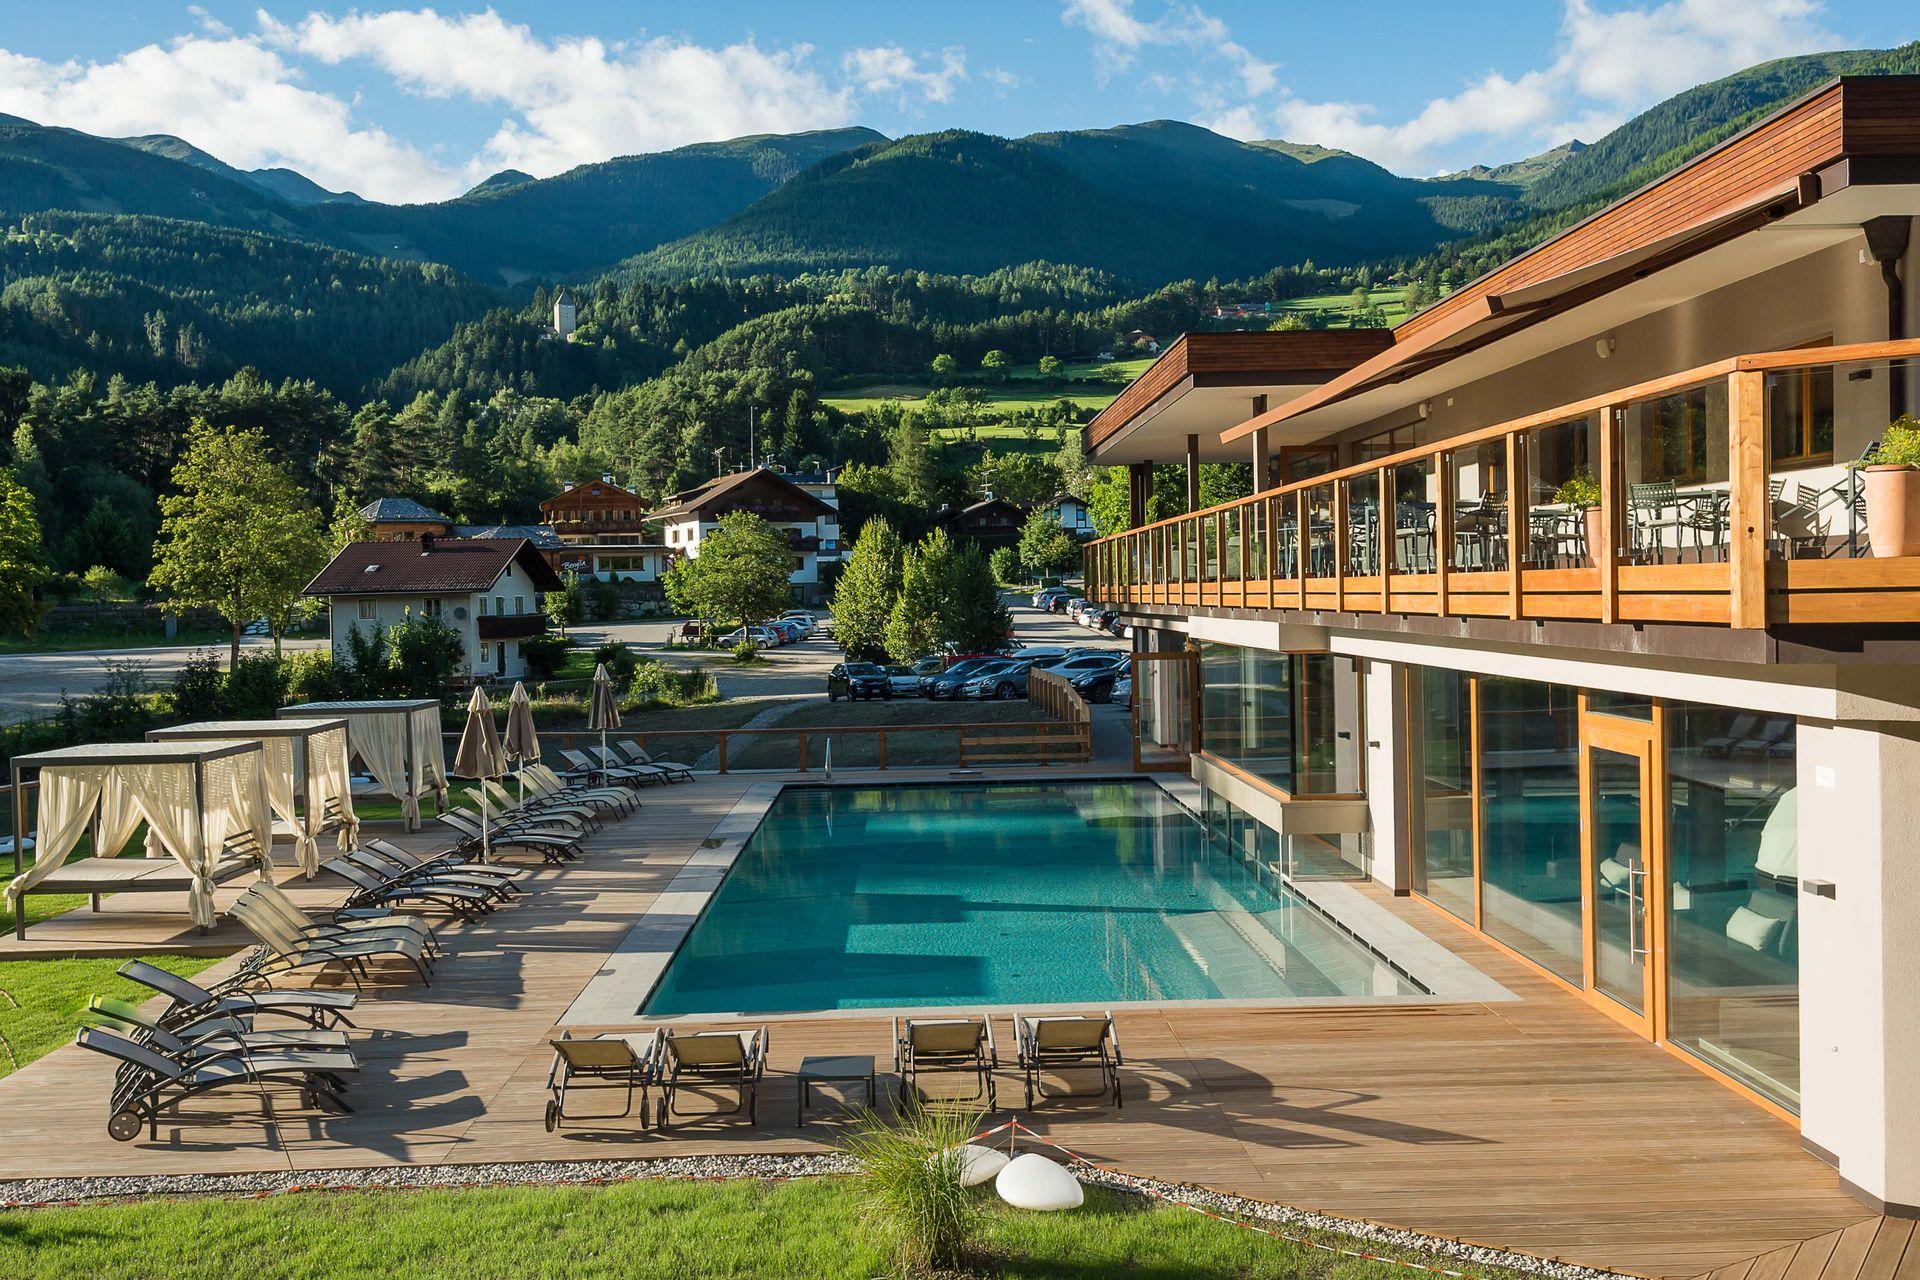 ALTO ADIGE -    GREEN LAKE HOTEL WEIHER    SPA RESORT